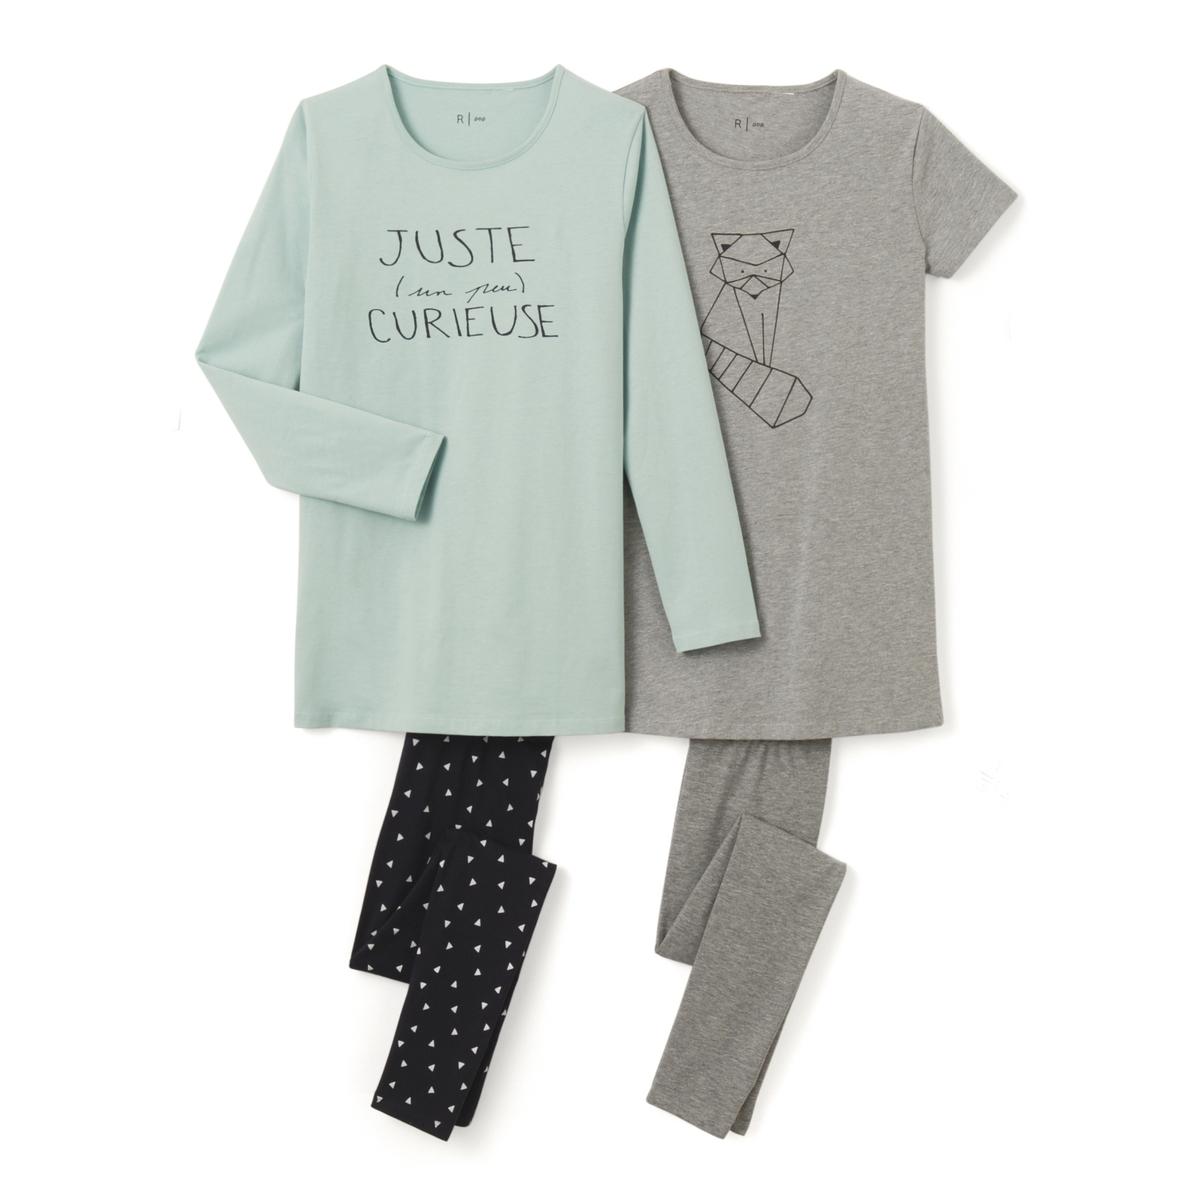 2er Pack Pyjamas, Jersey, 10 16 Jahre